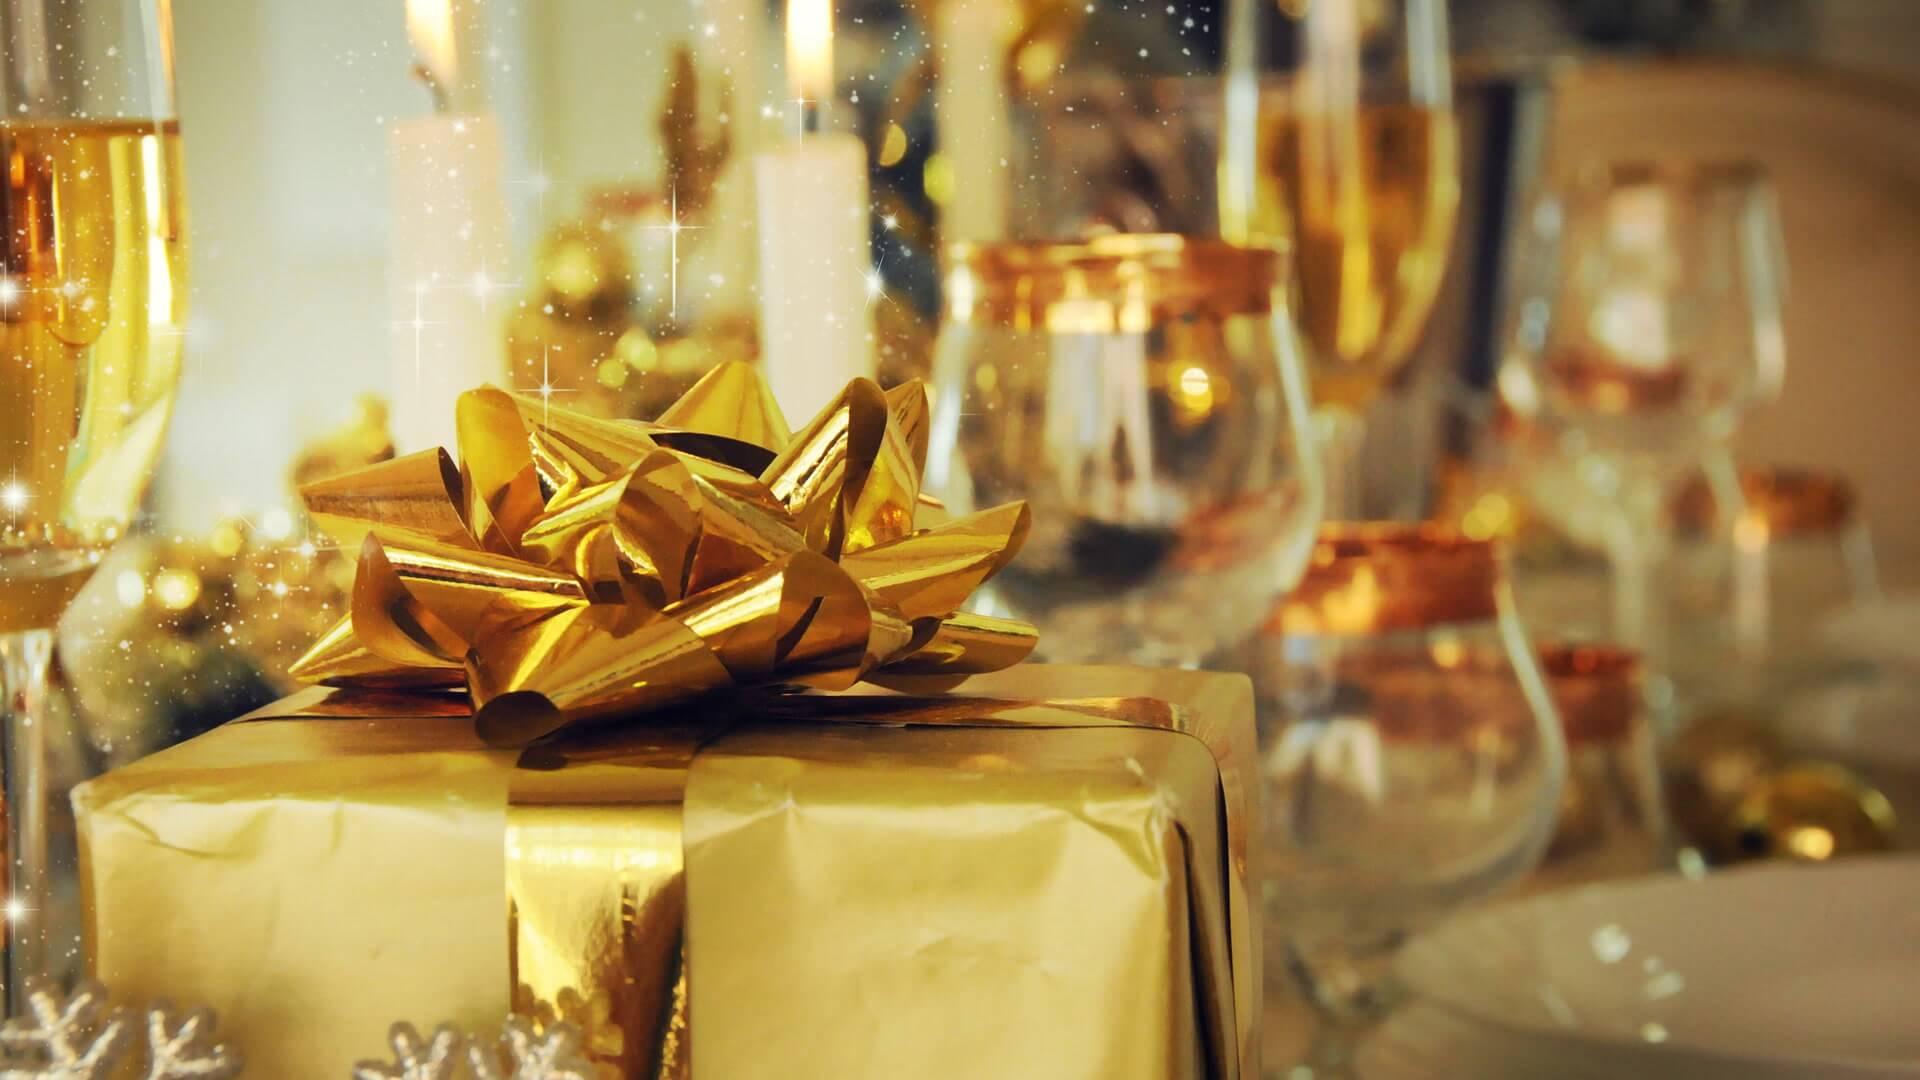 Restaurants Open On Christmas Day 2018 Restaurants Open On Christmas Day | GOBankingRates Restaurants Open On Christmas Day 2018